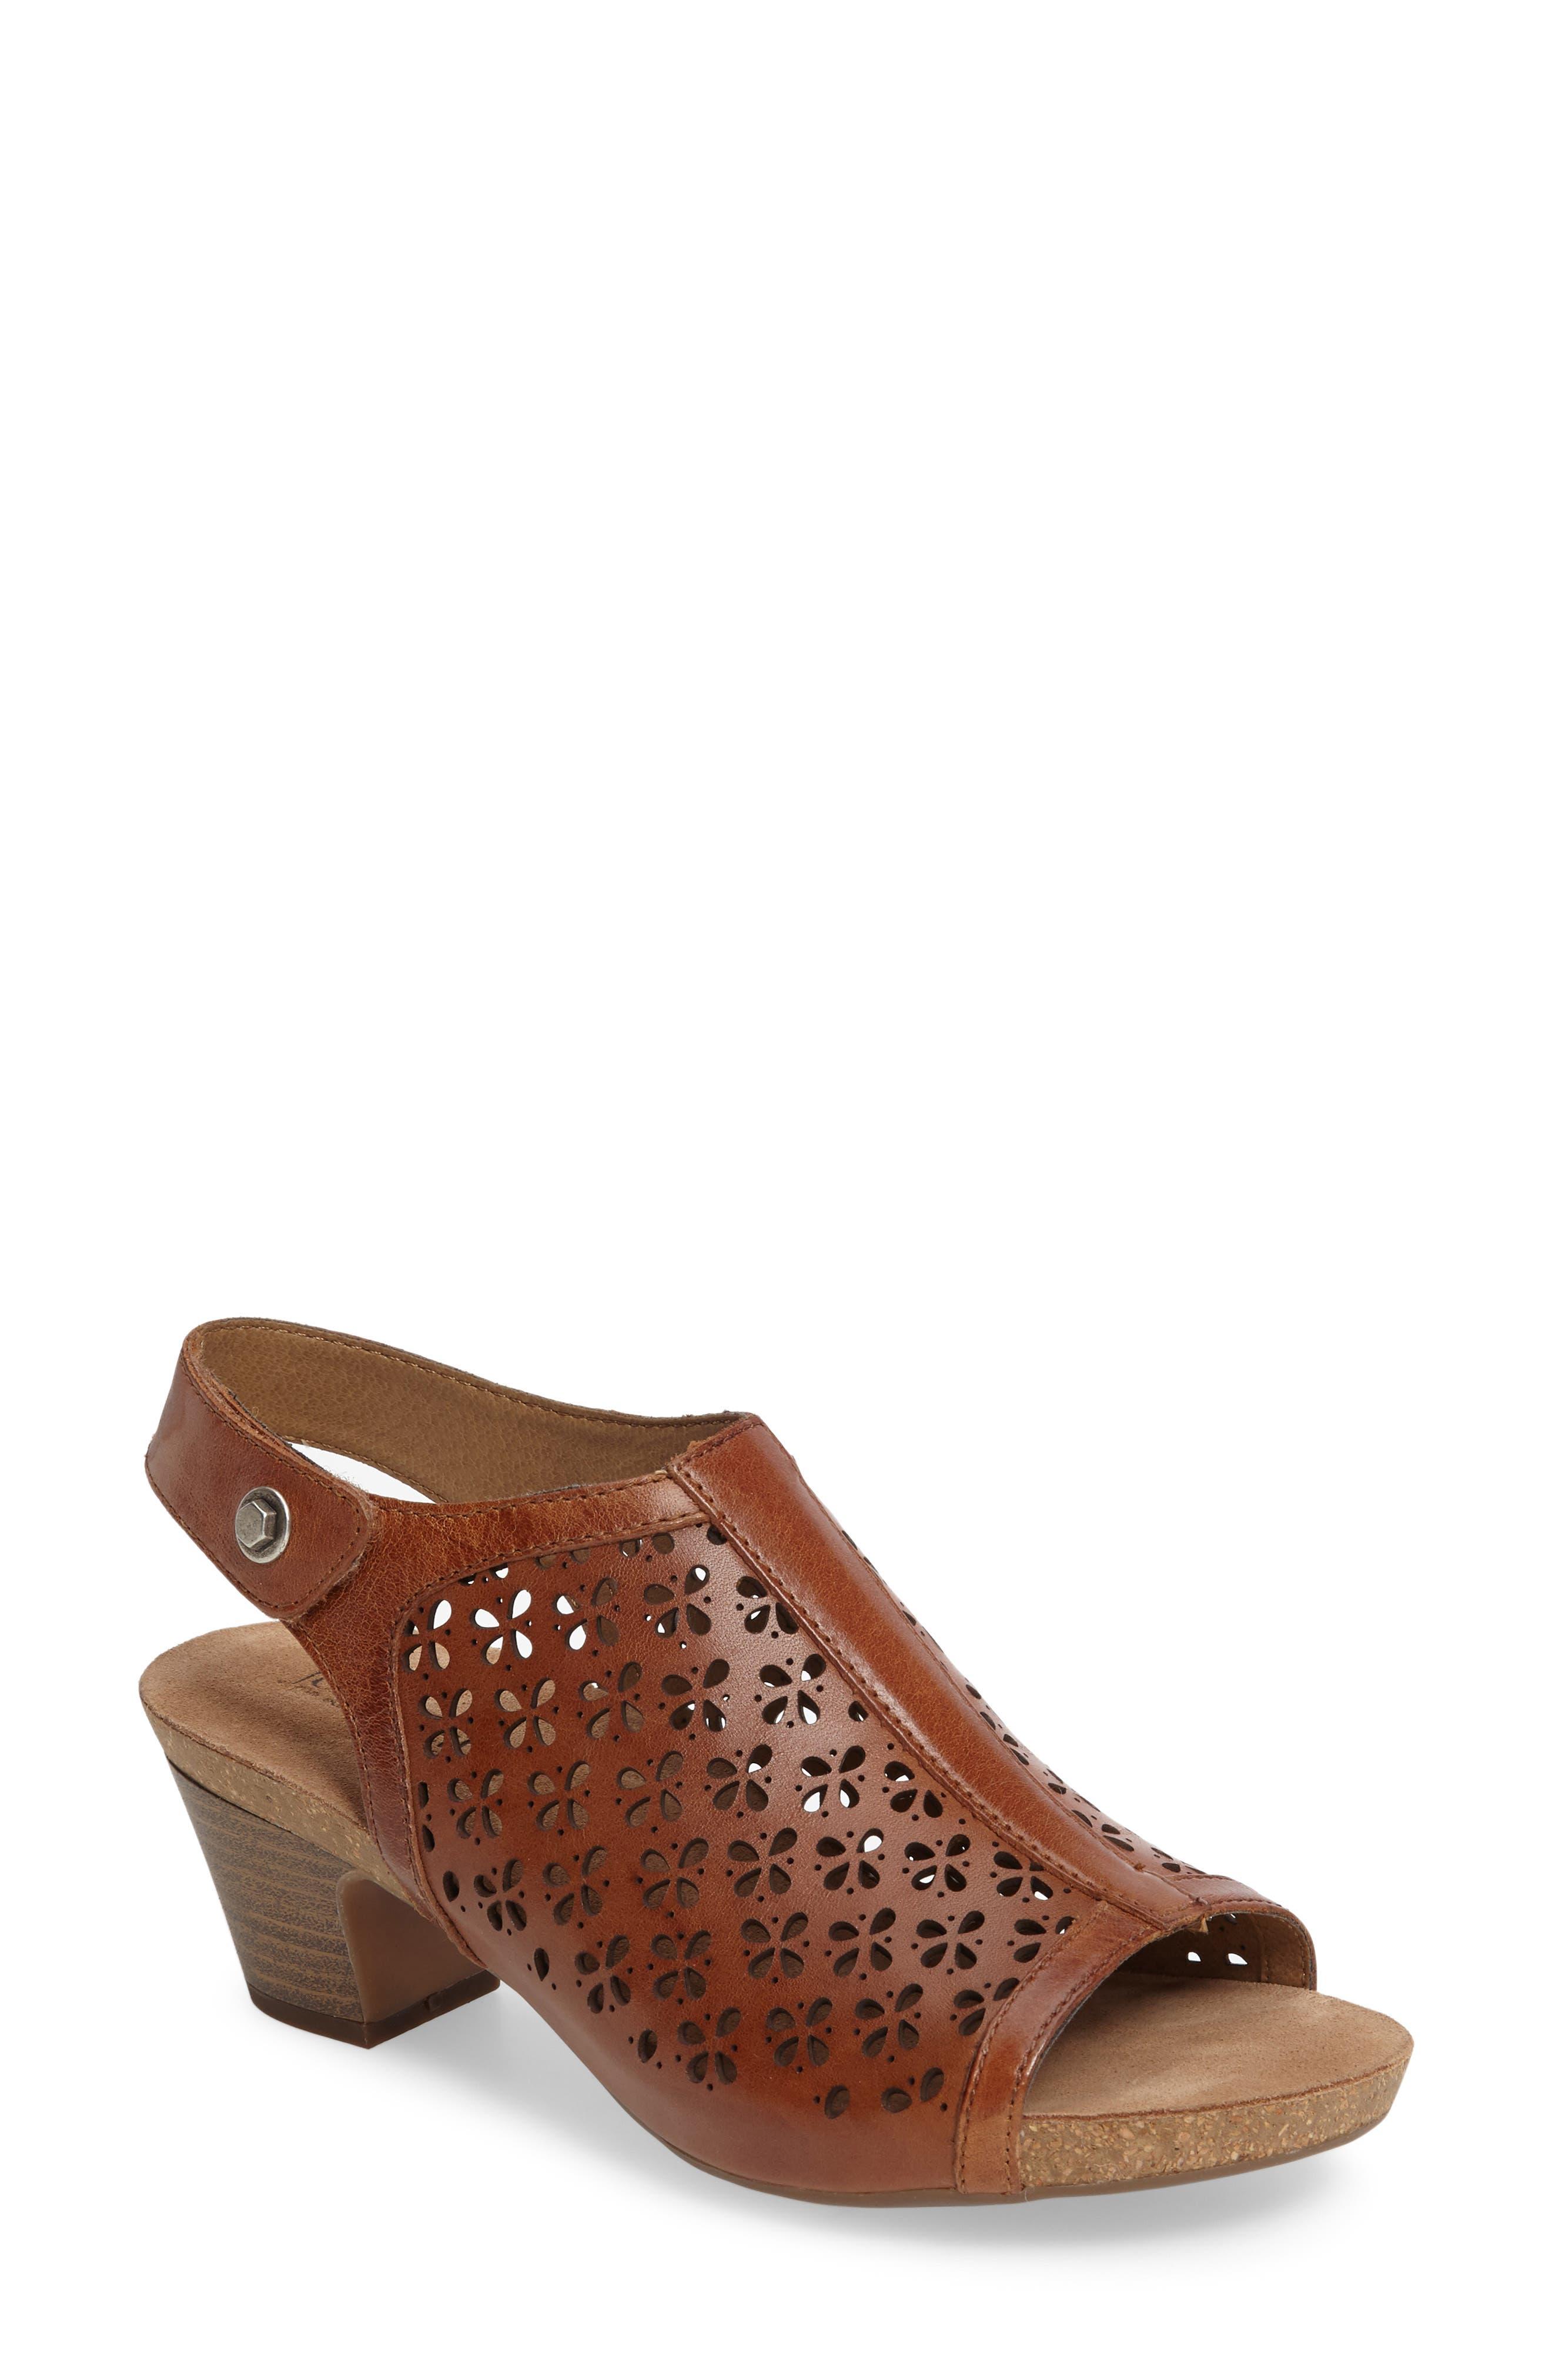 Main Image - Josef Seibel Ruth 33 Cutout Slingback Sandal (Women)